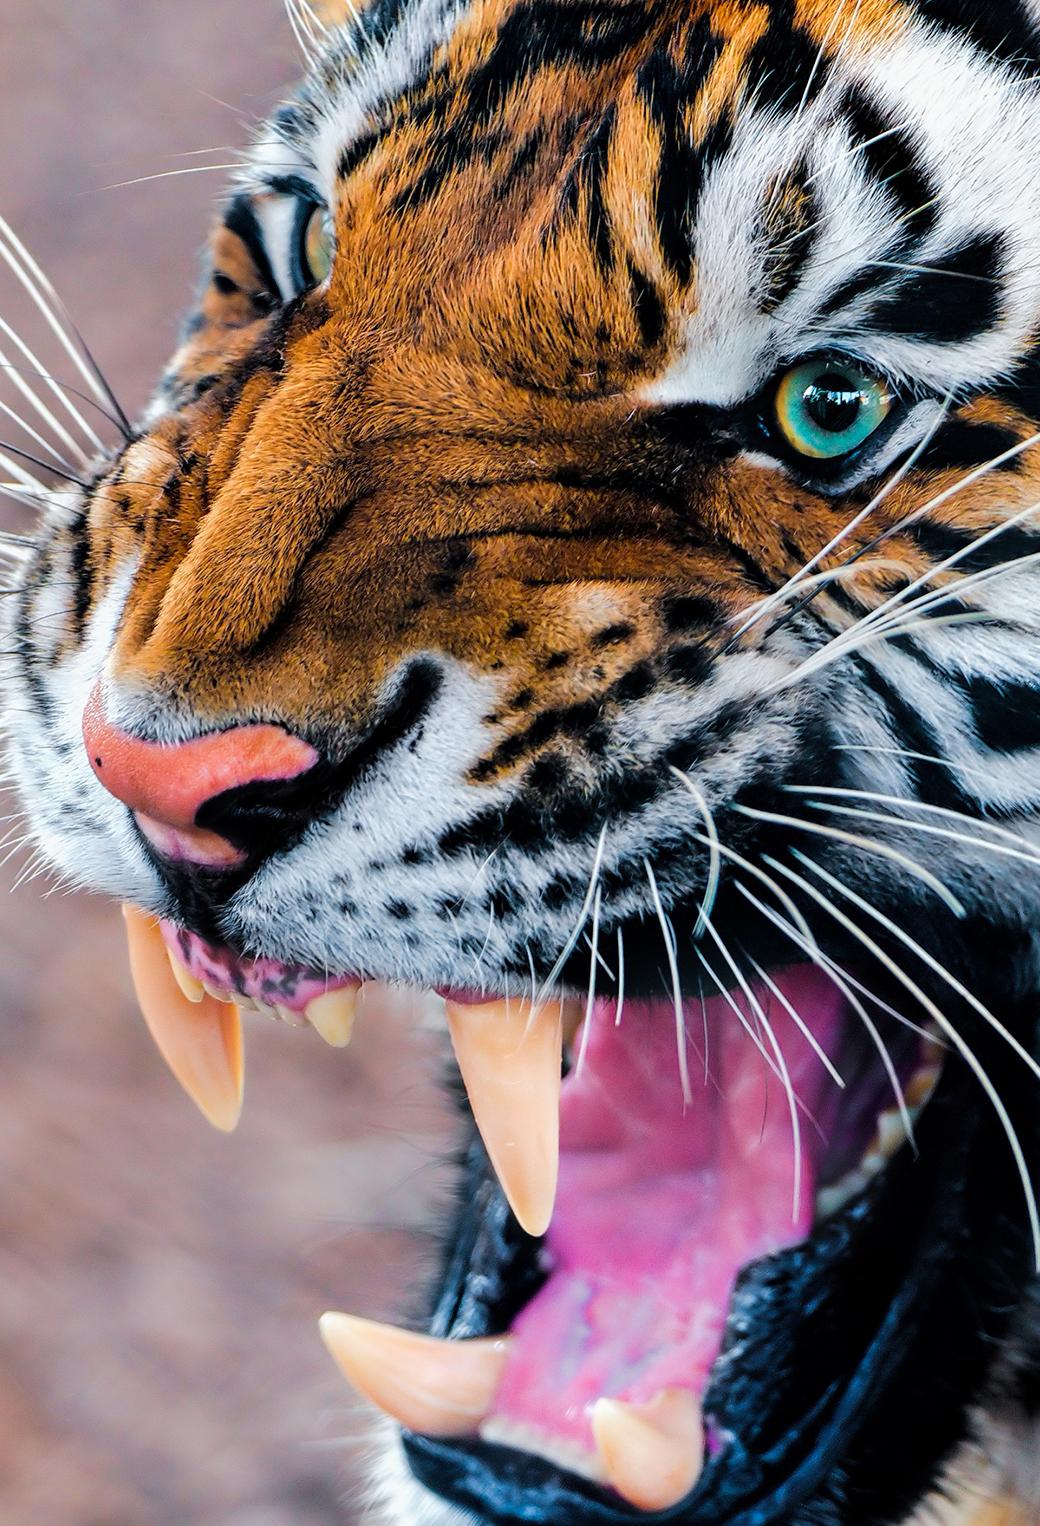 Snarling Tiger 3Wallpapers iPhone Parallax Snarling Tiger